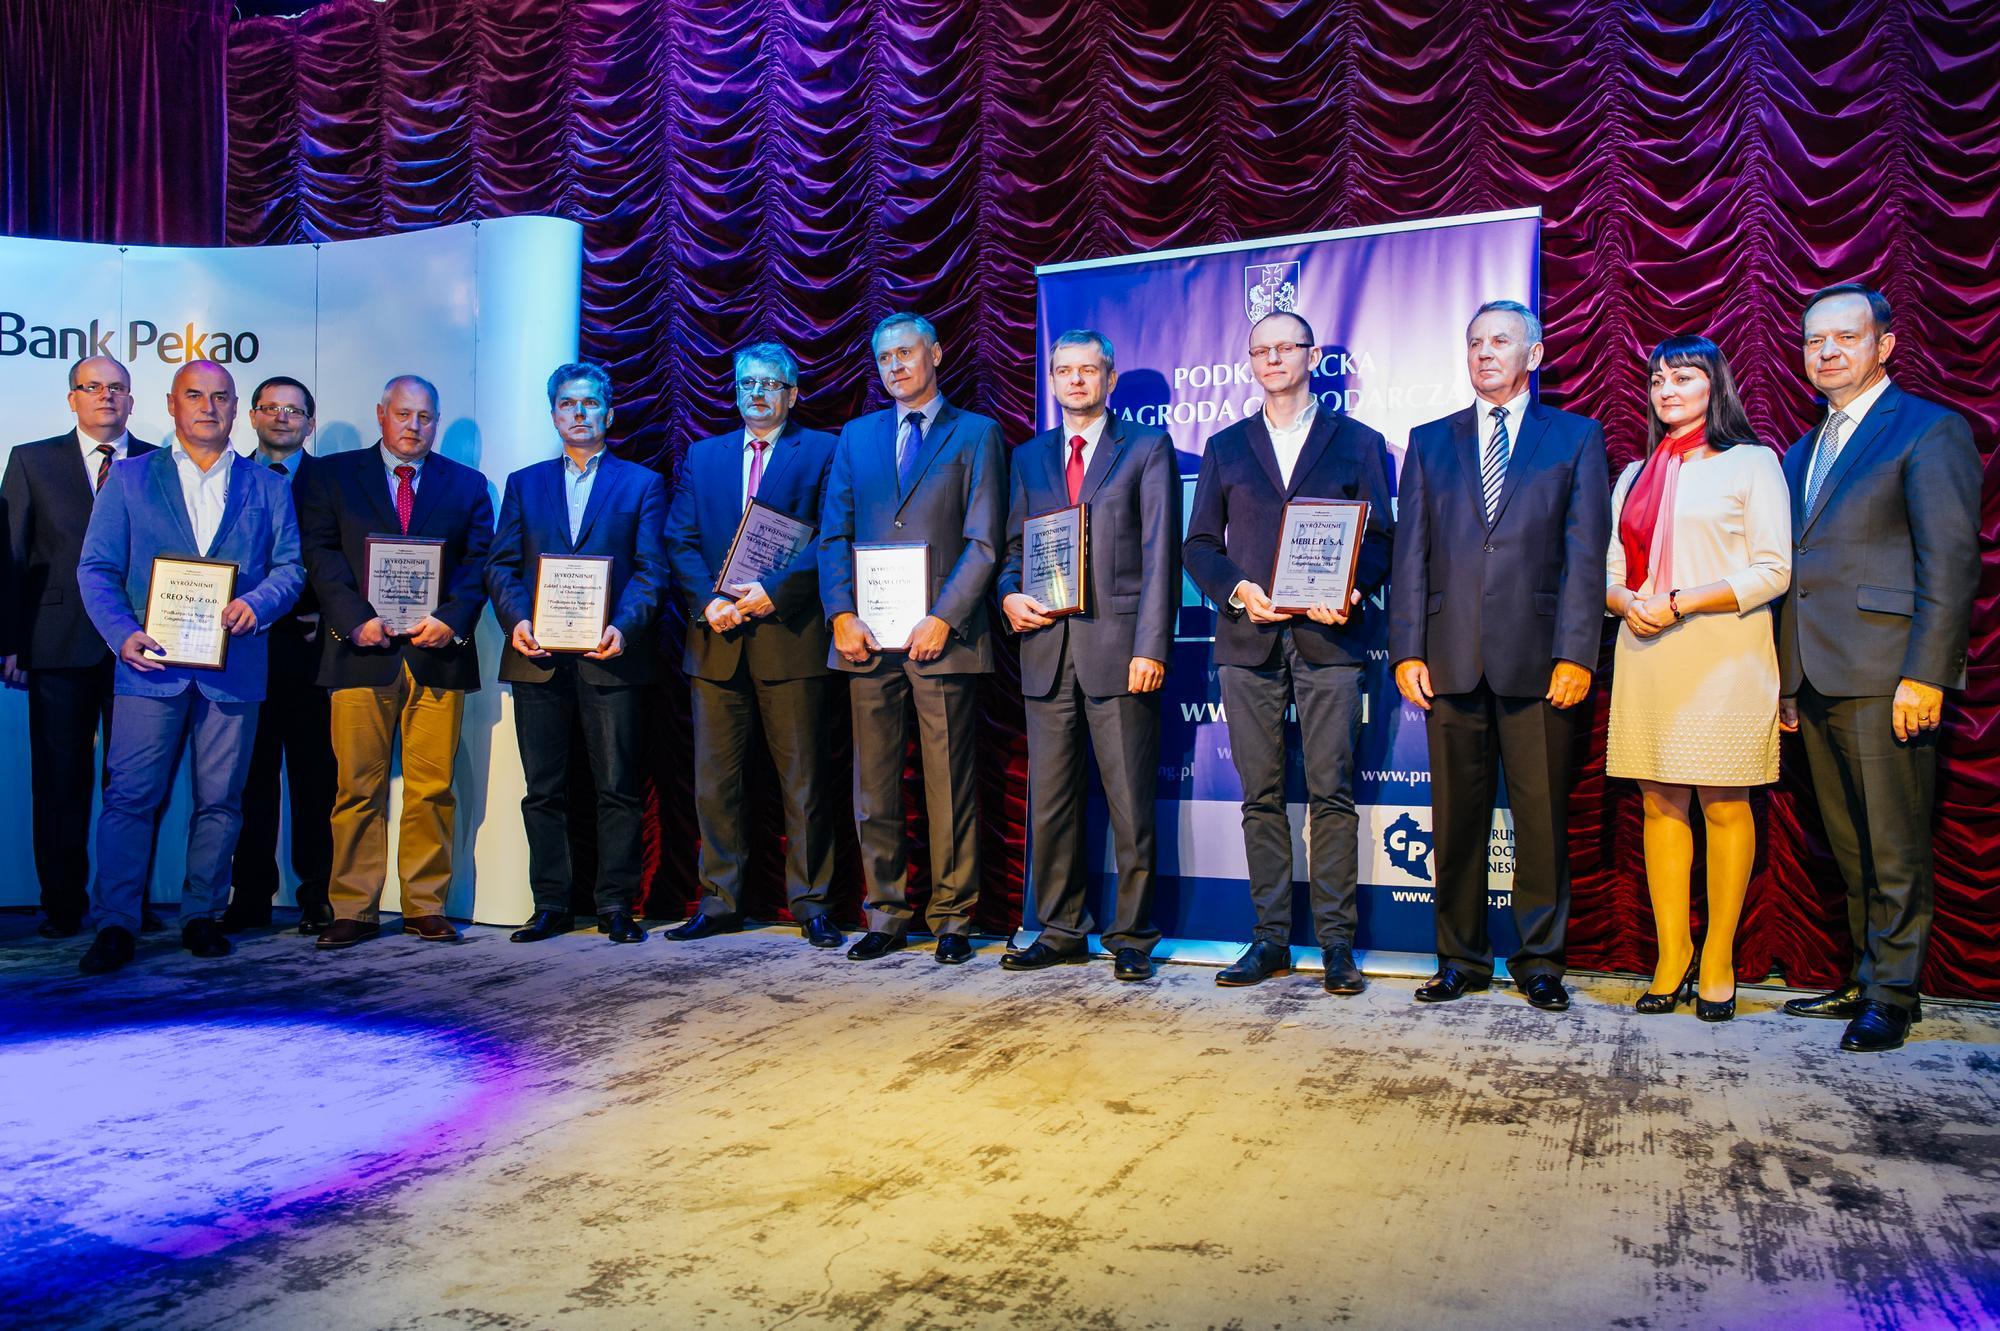 Nagrody medyczne na Podkarpciu rozdane